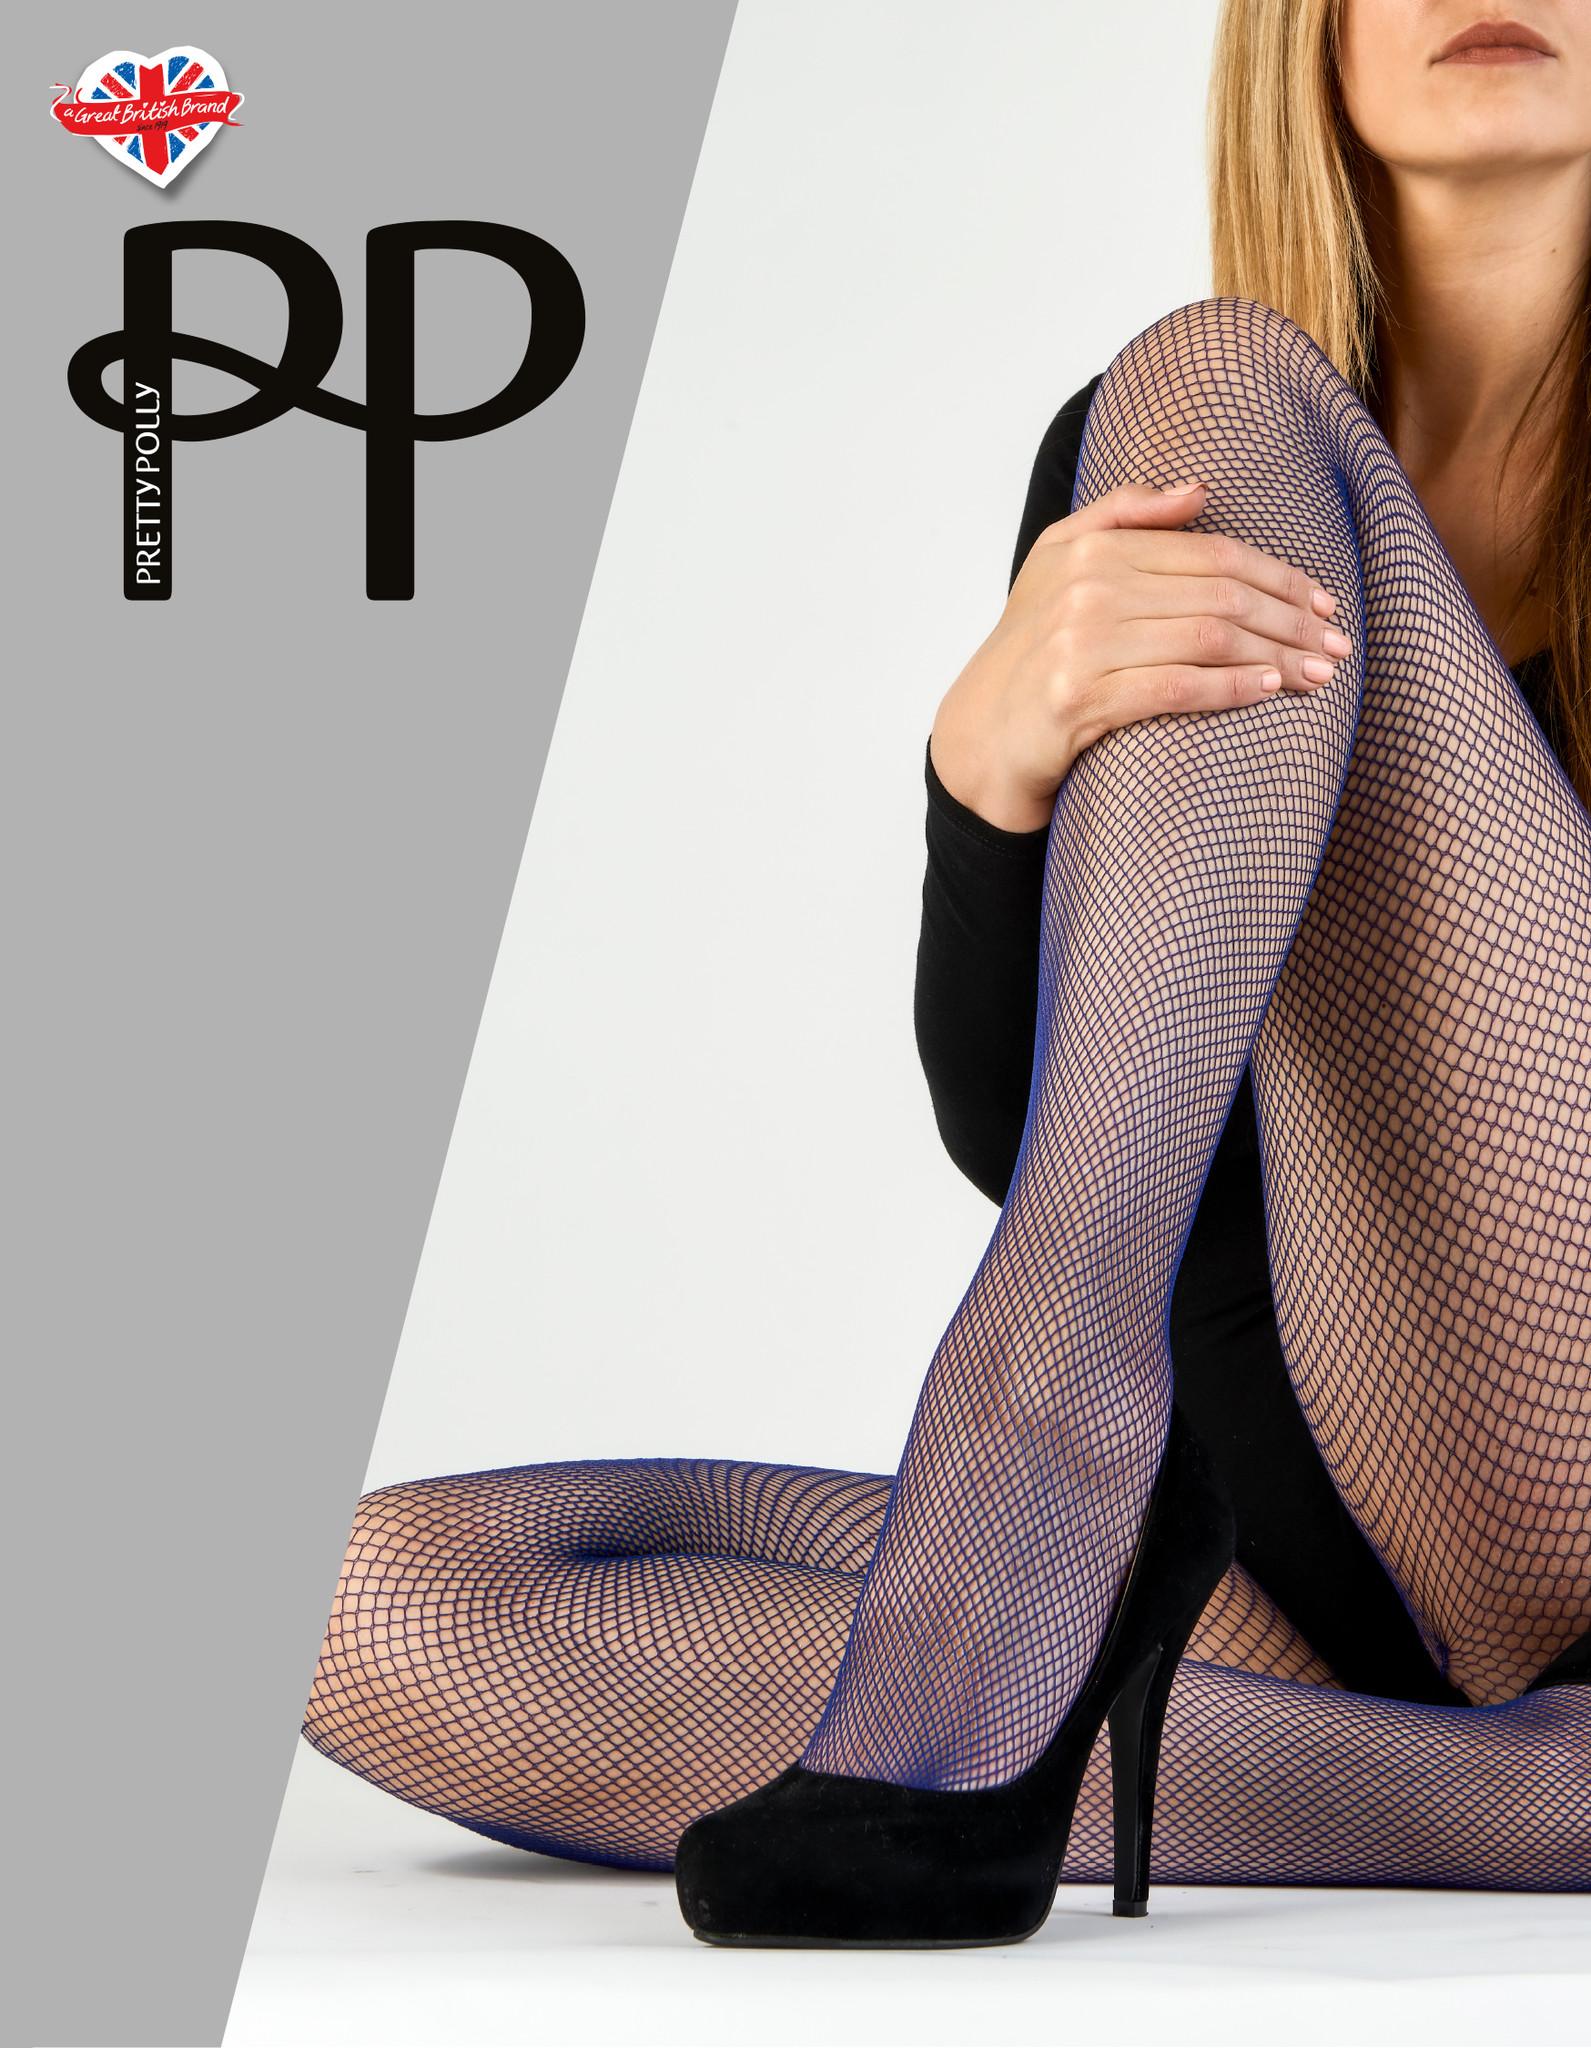 Pretty Polly Pretty Polly Coloured Fishnet Panty - One Size